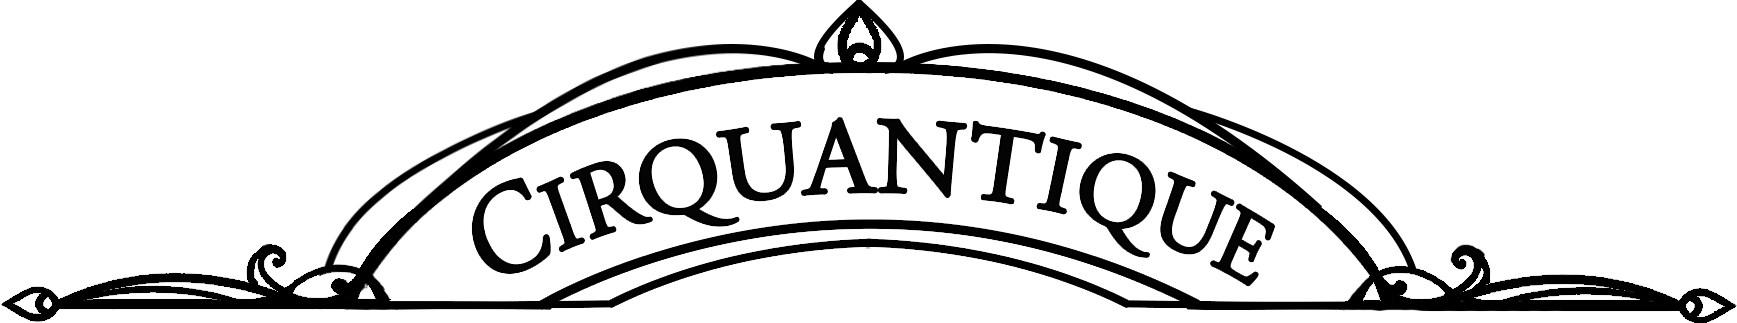 Cirquantique logo noir crop.png